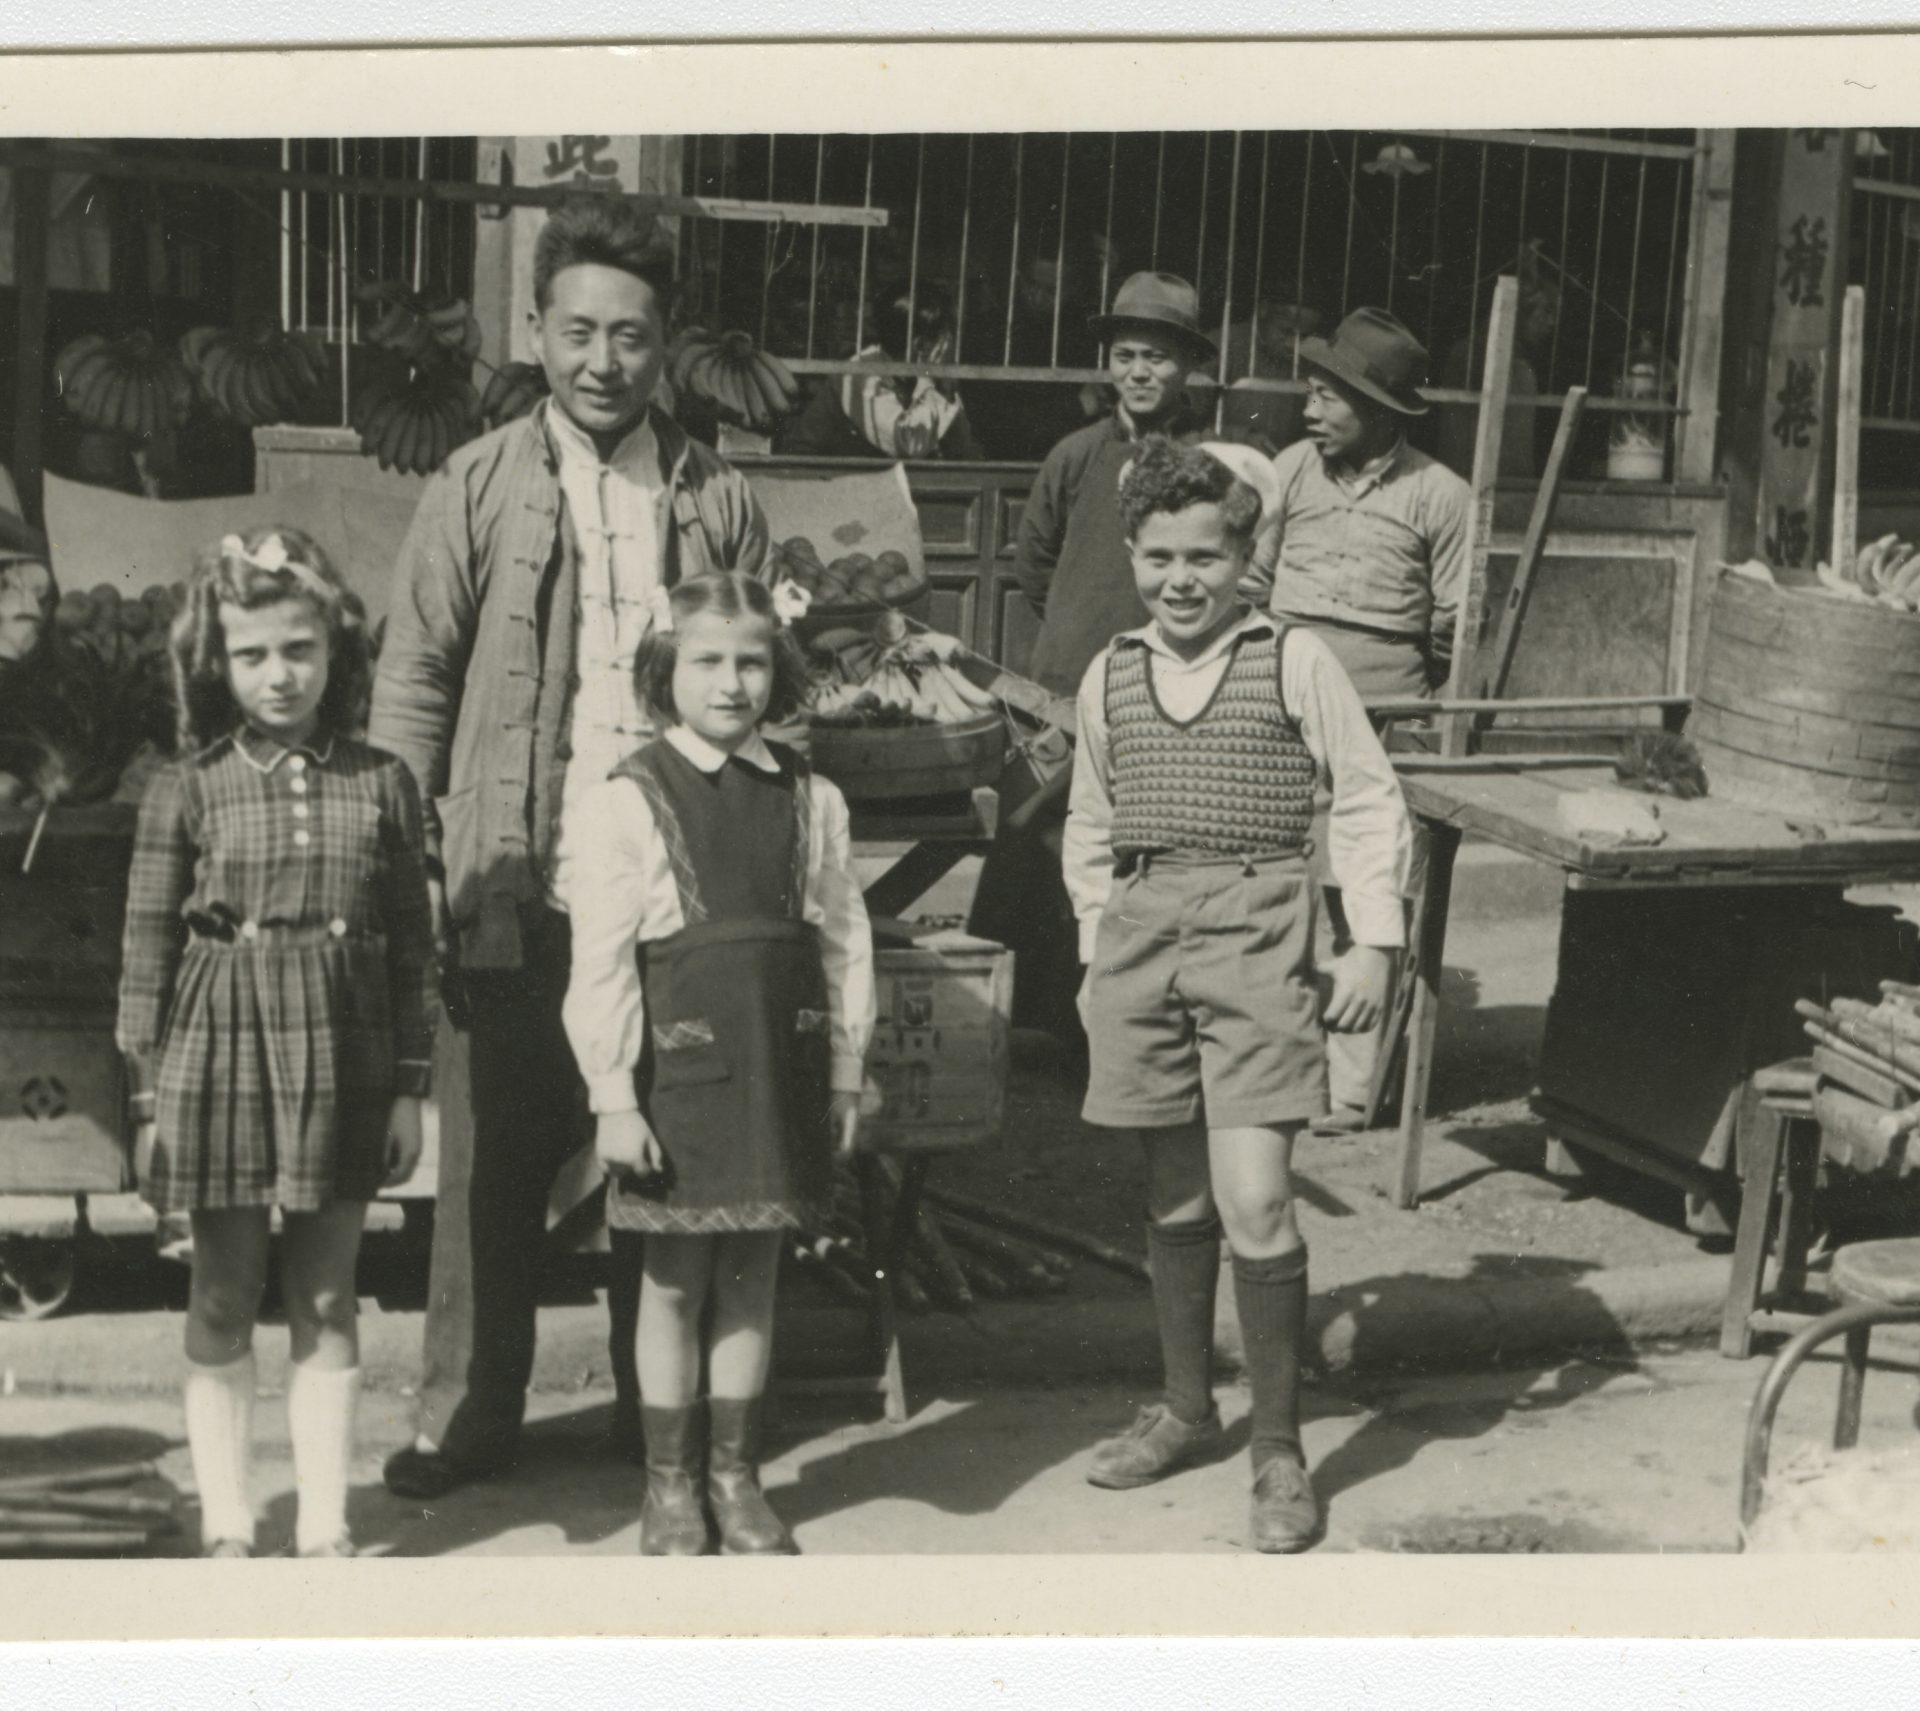 Photograph of the children Vera Voticky, Eva Kanturek and Milan Voticky stand in a local market in Shanghai.